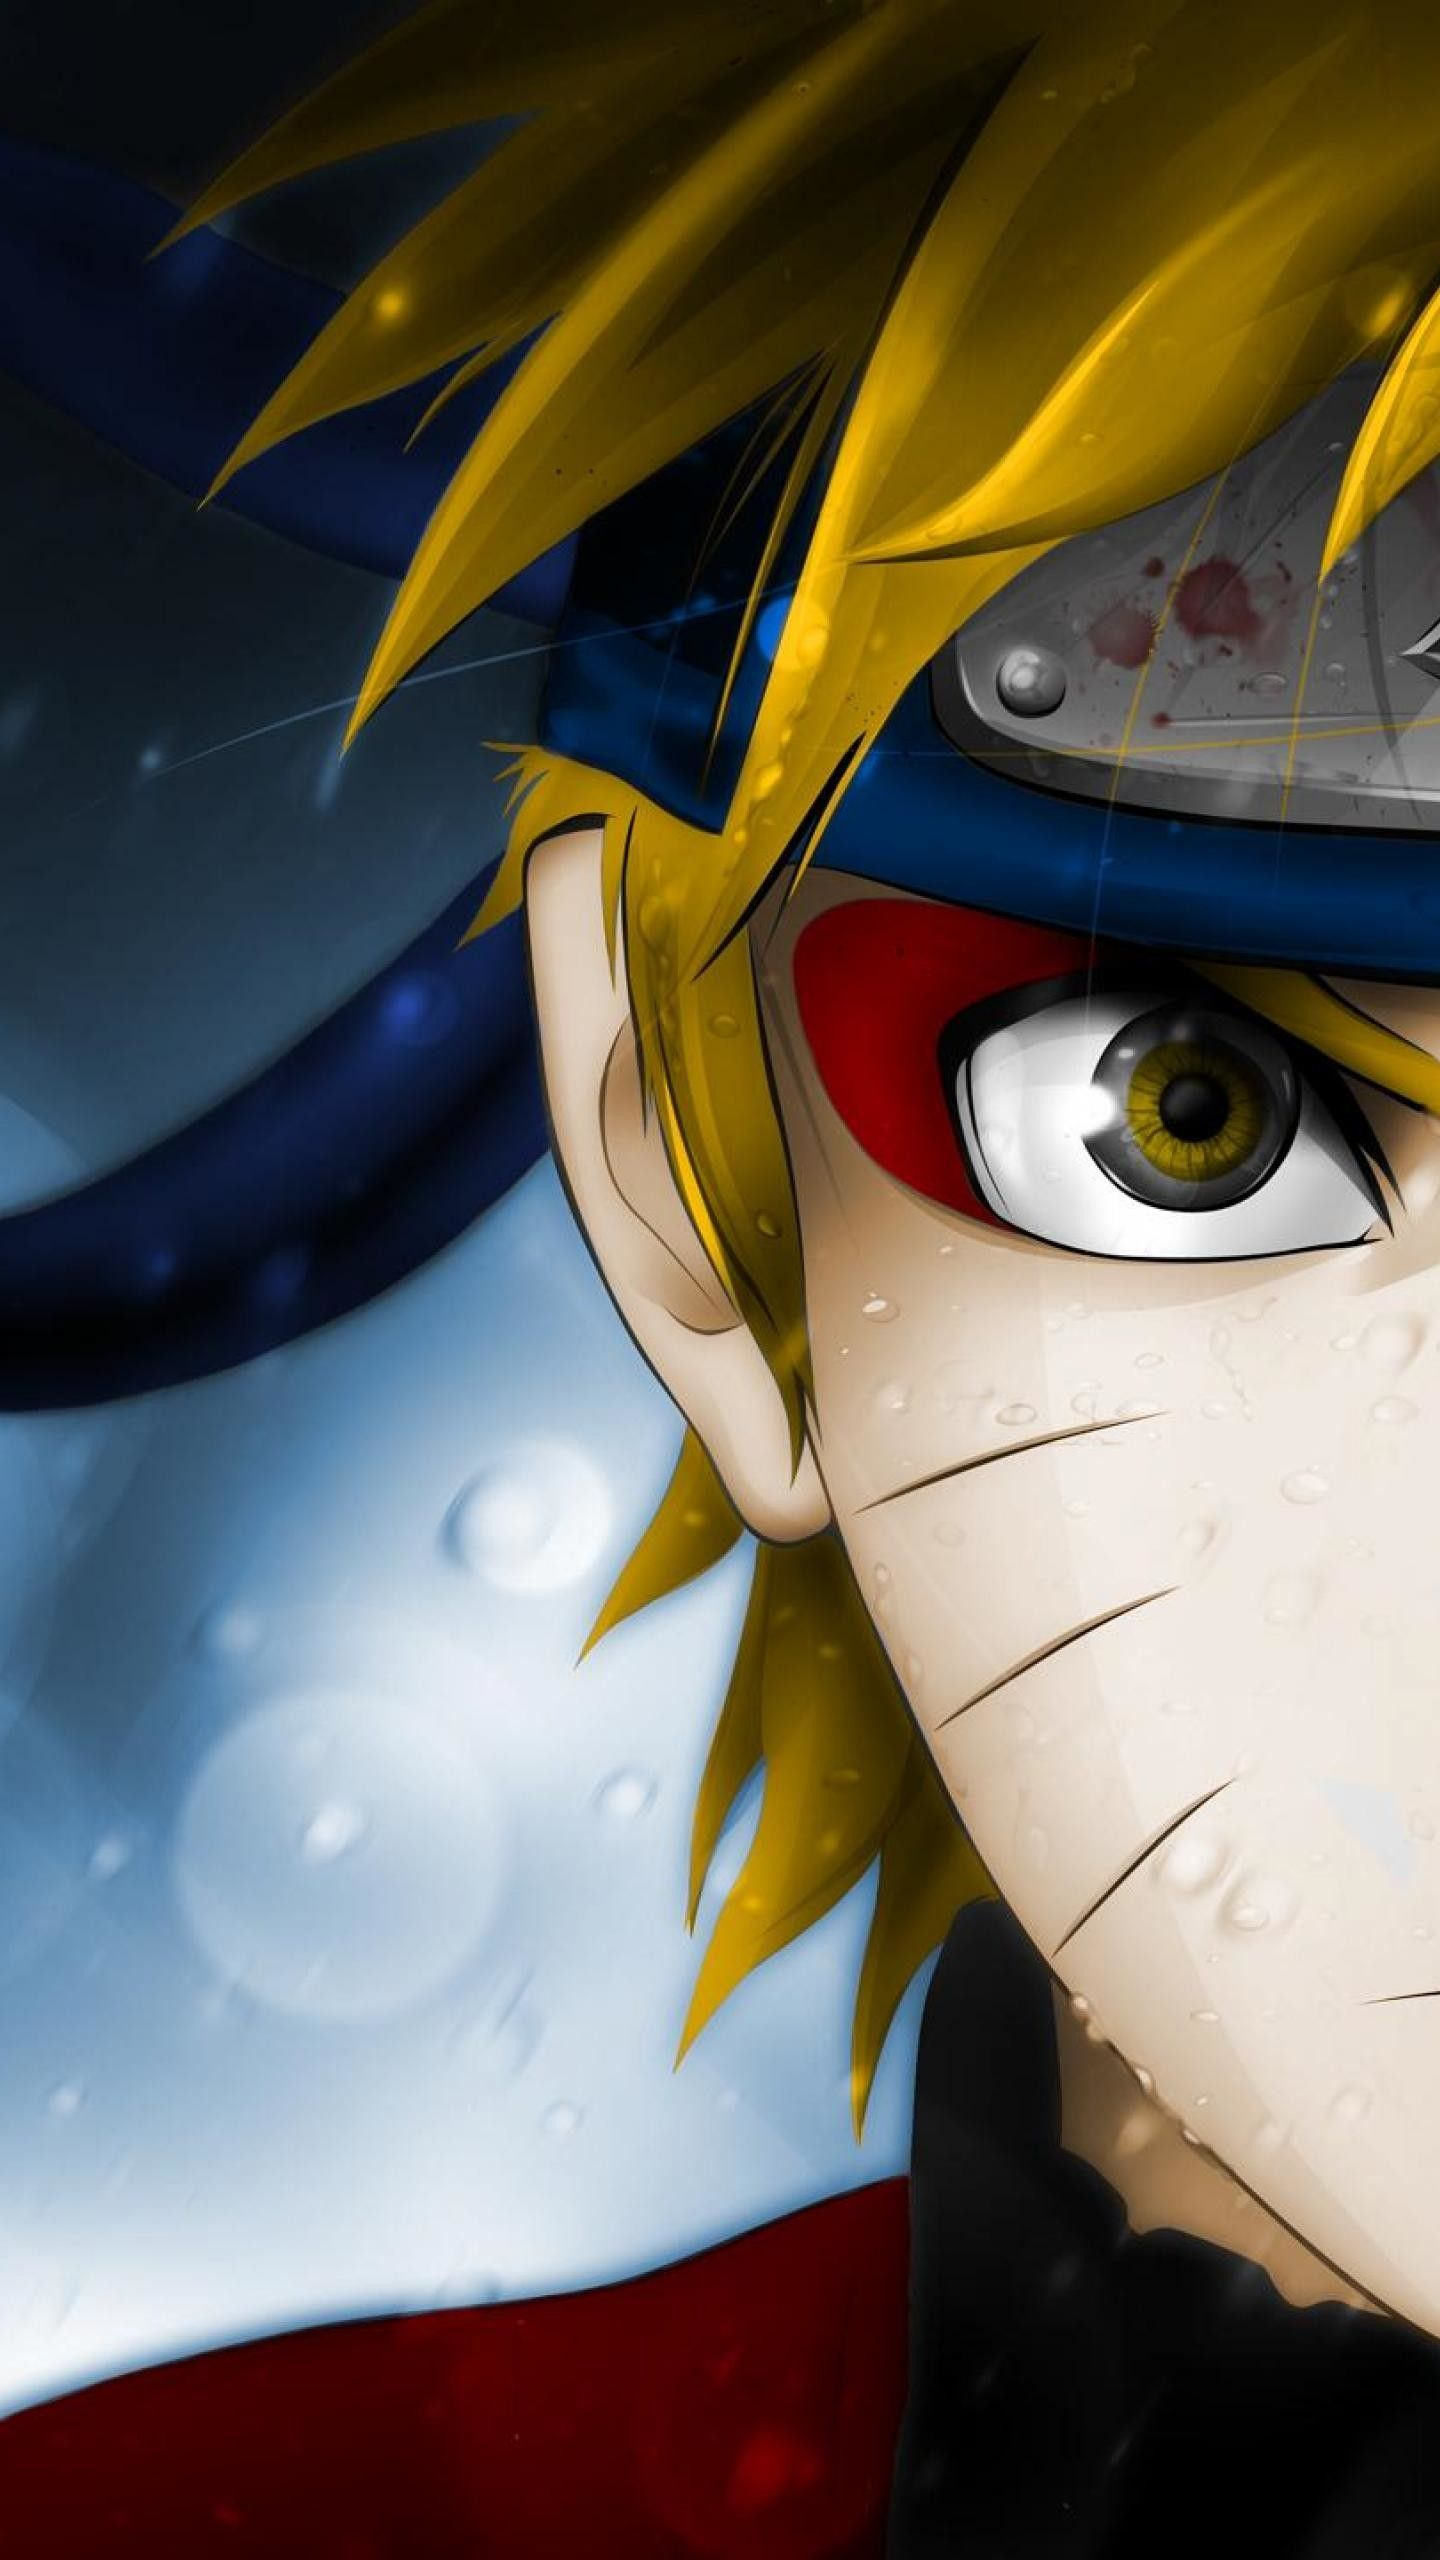 78 Naruto Wallpapers On Wallpaperplay Narutowallpaper Arte Naruto